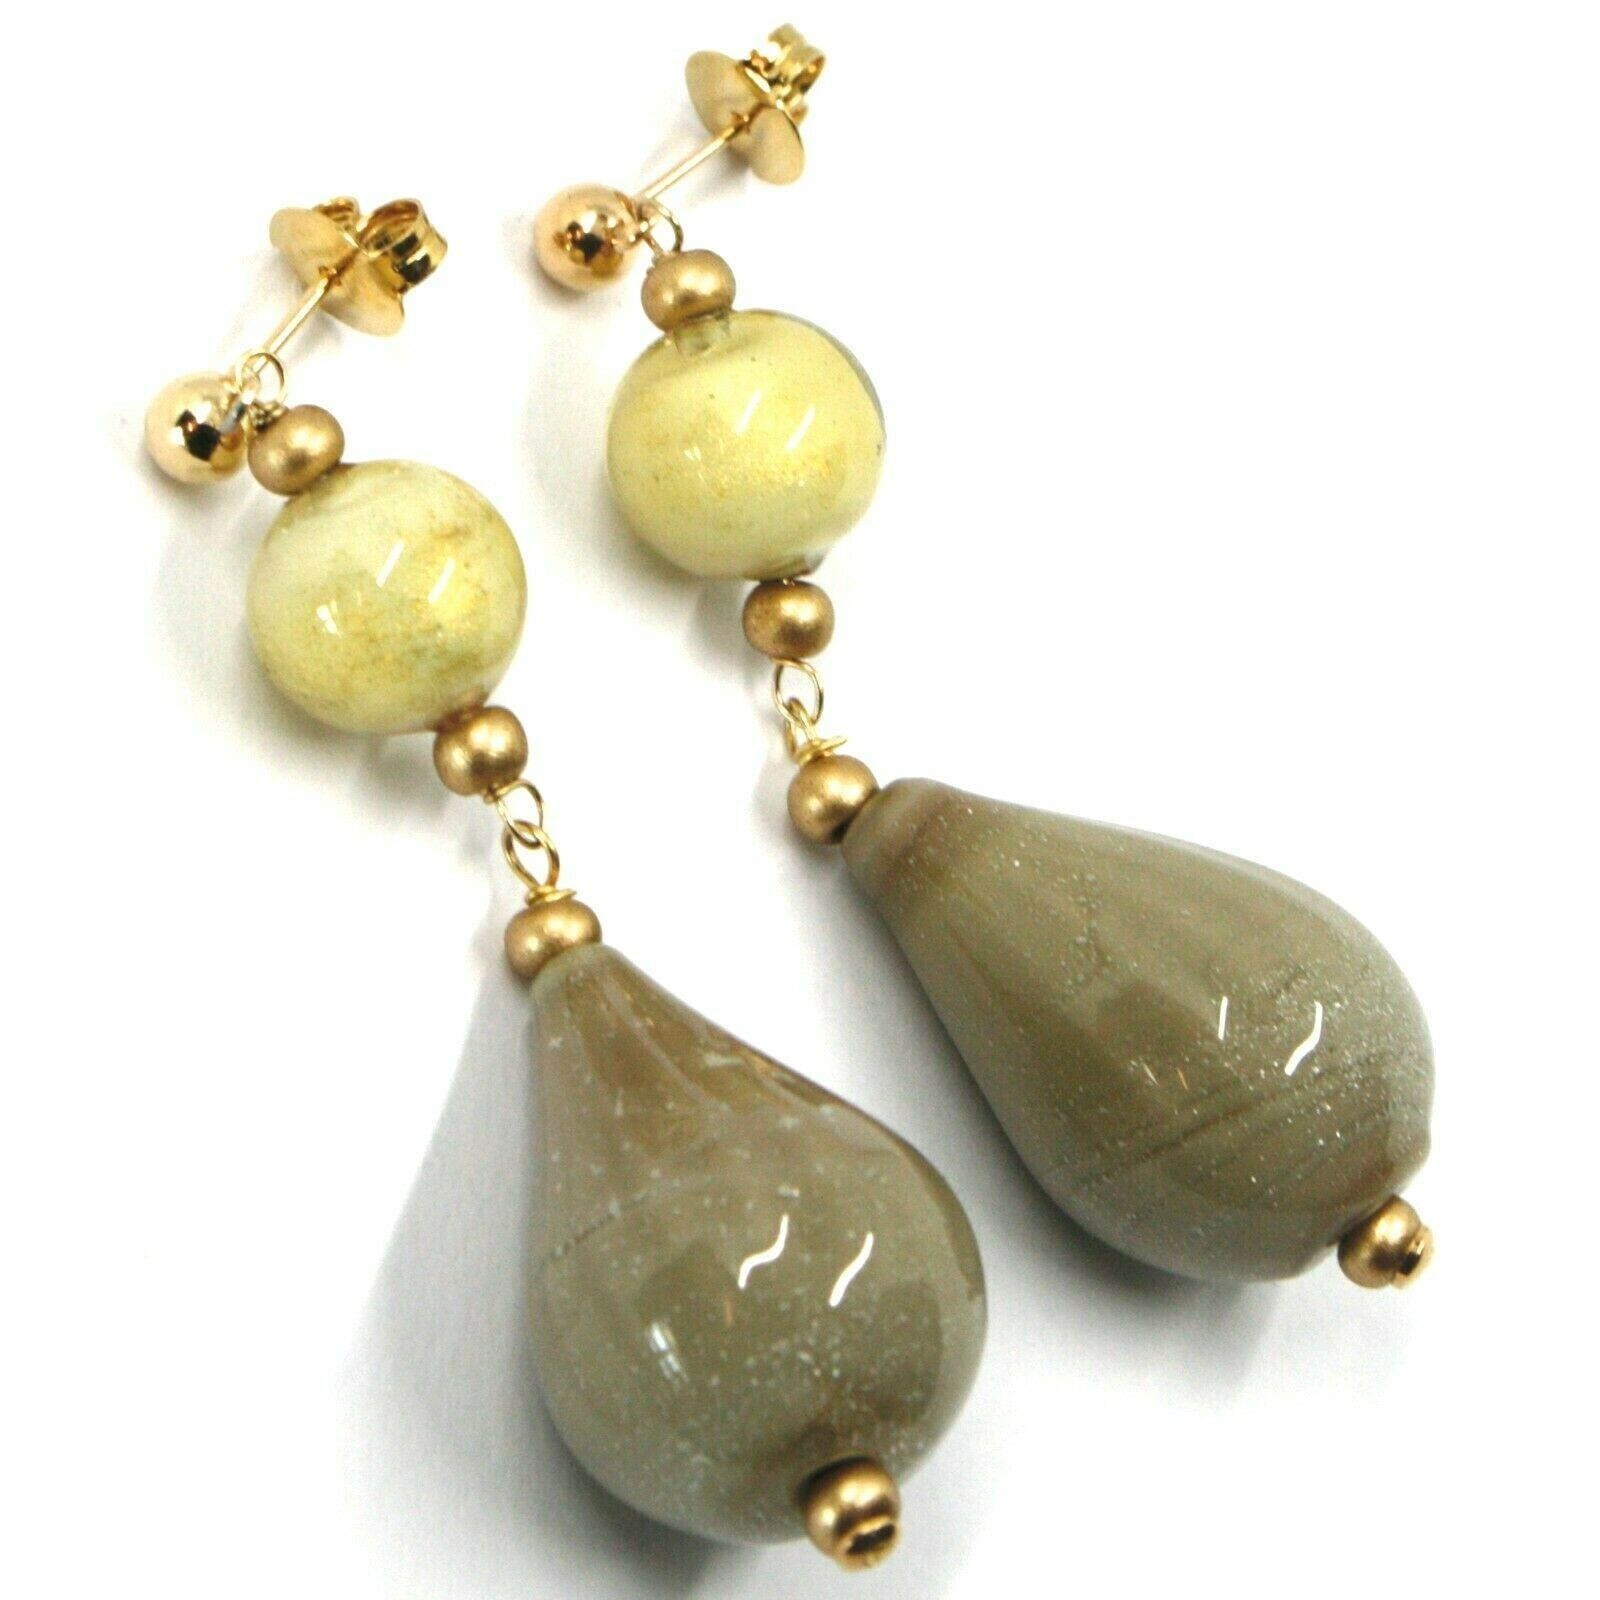 Earrings Antica Murrina Venezia, OR631A57, Hanging, Drop Glass Beige 3cm